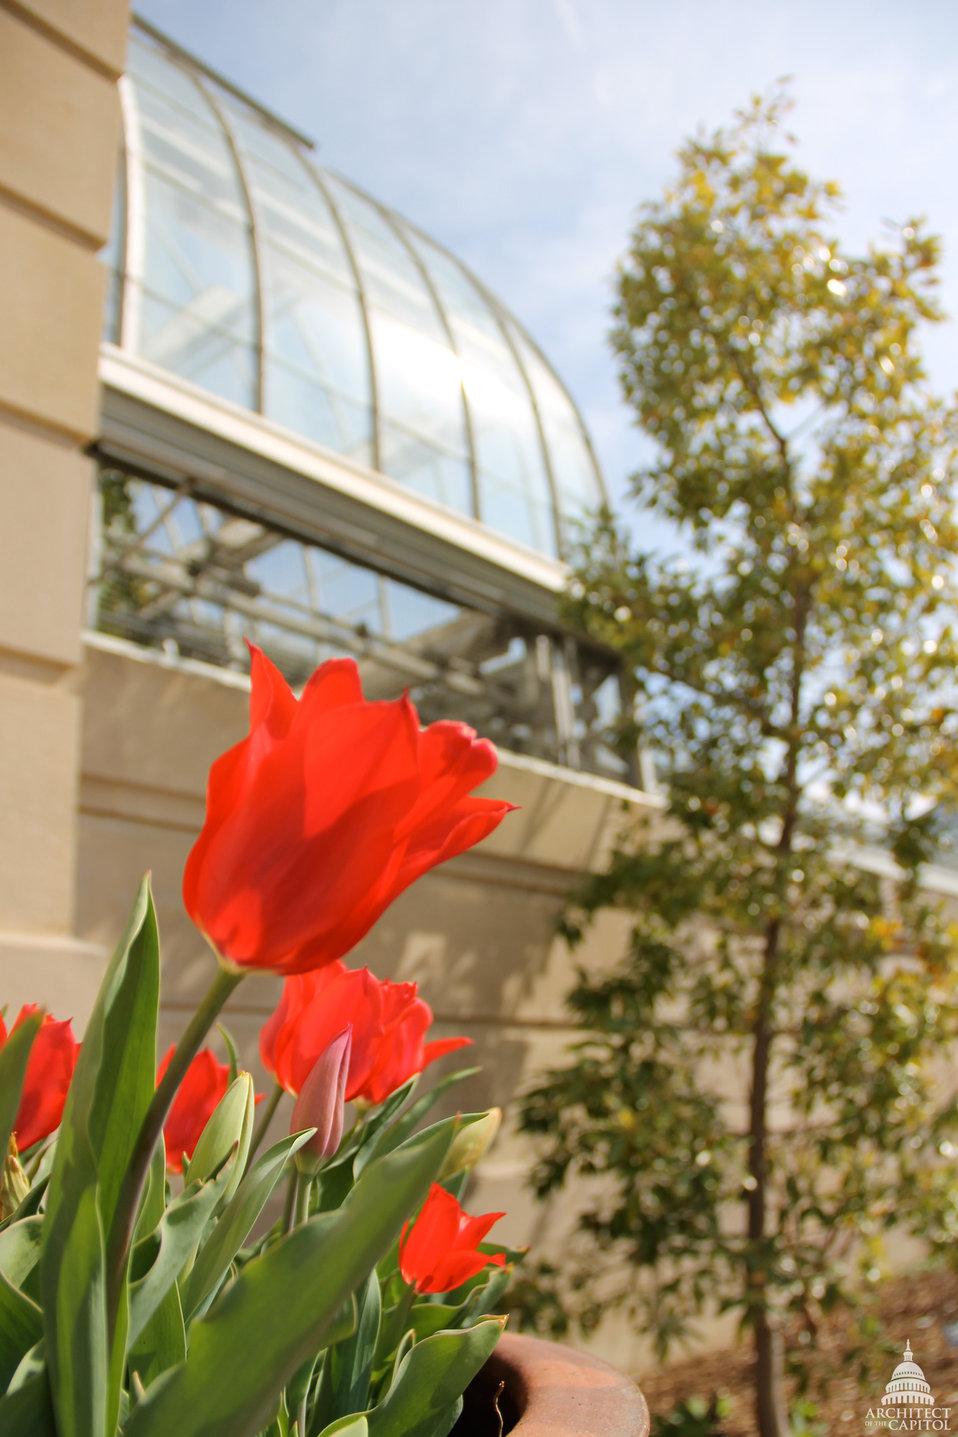 Tulips at the U.S. Botanic Garden